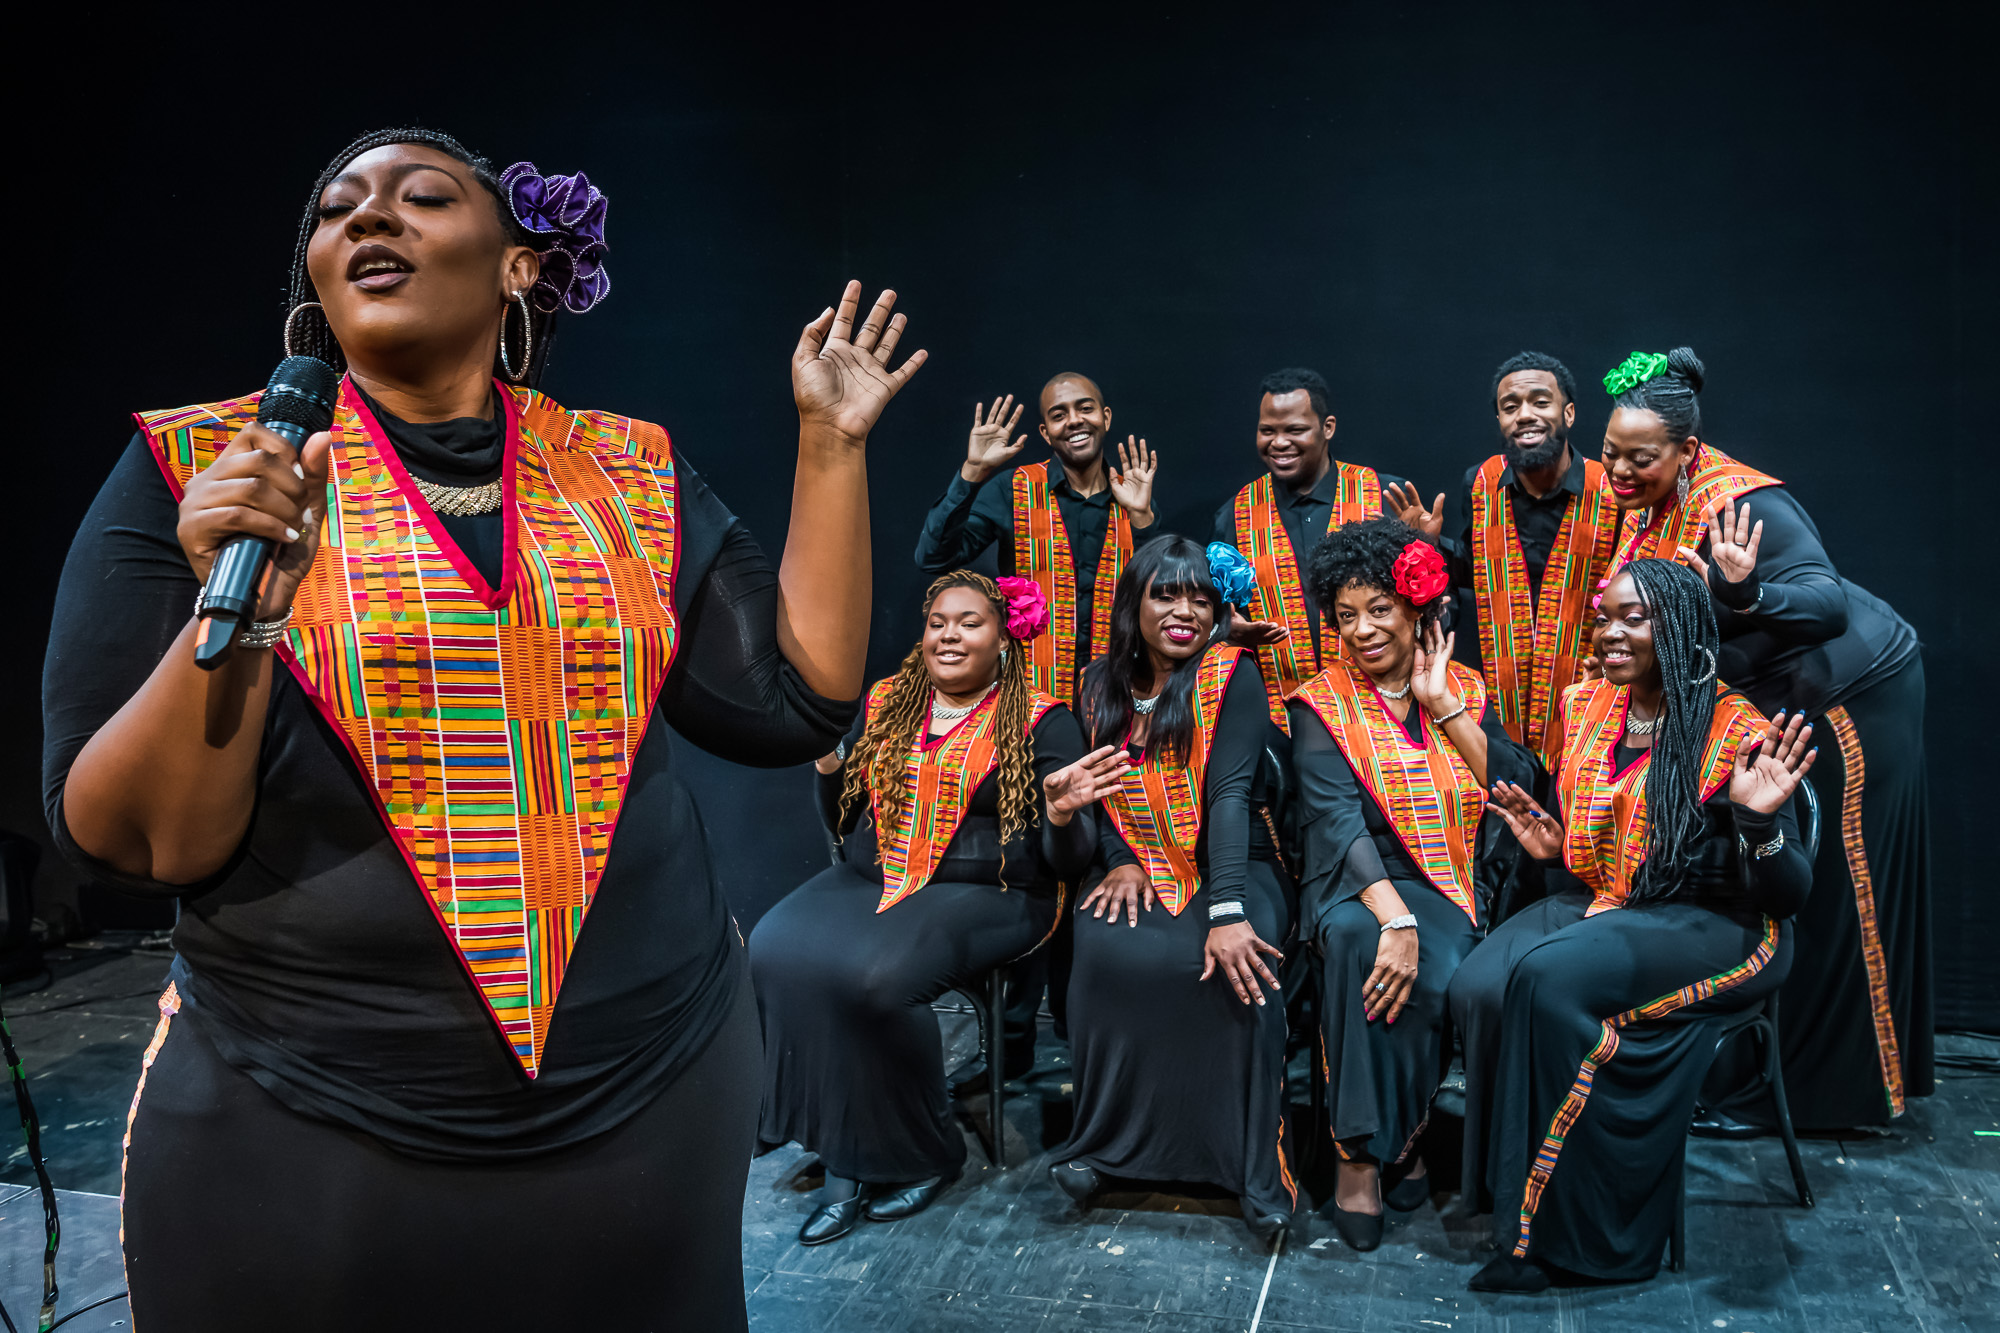 The World Famous Harlem Gospel Choir performs at Blues BBQ Festival at Hudson River Park